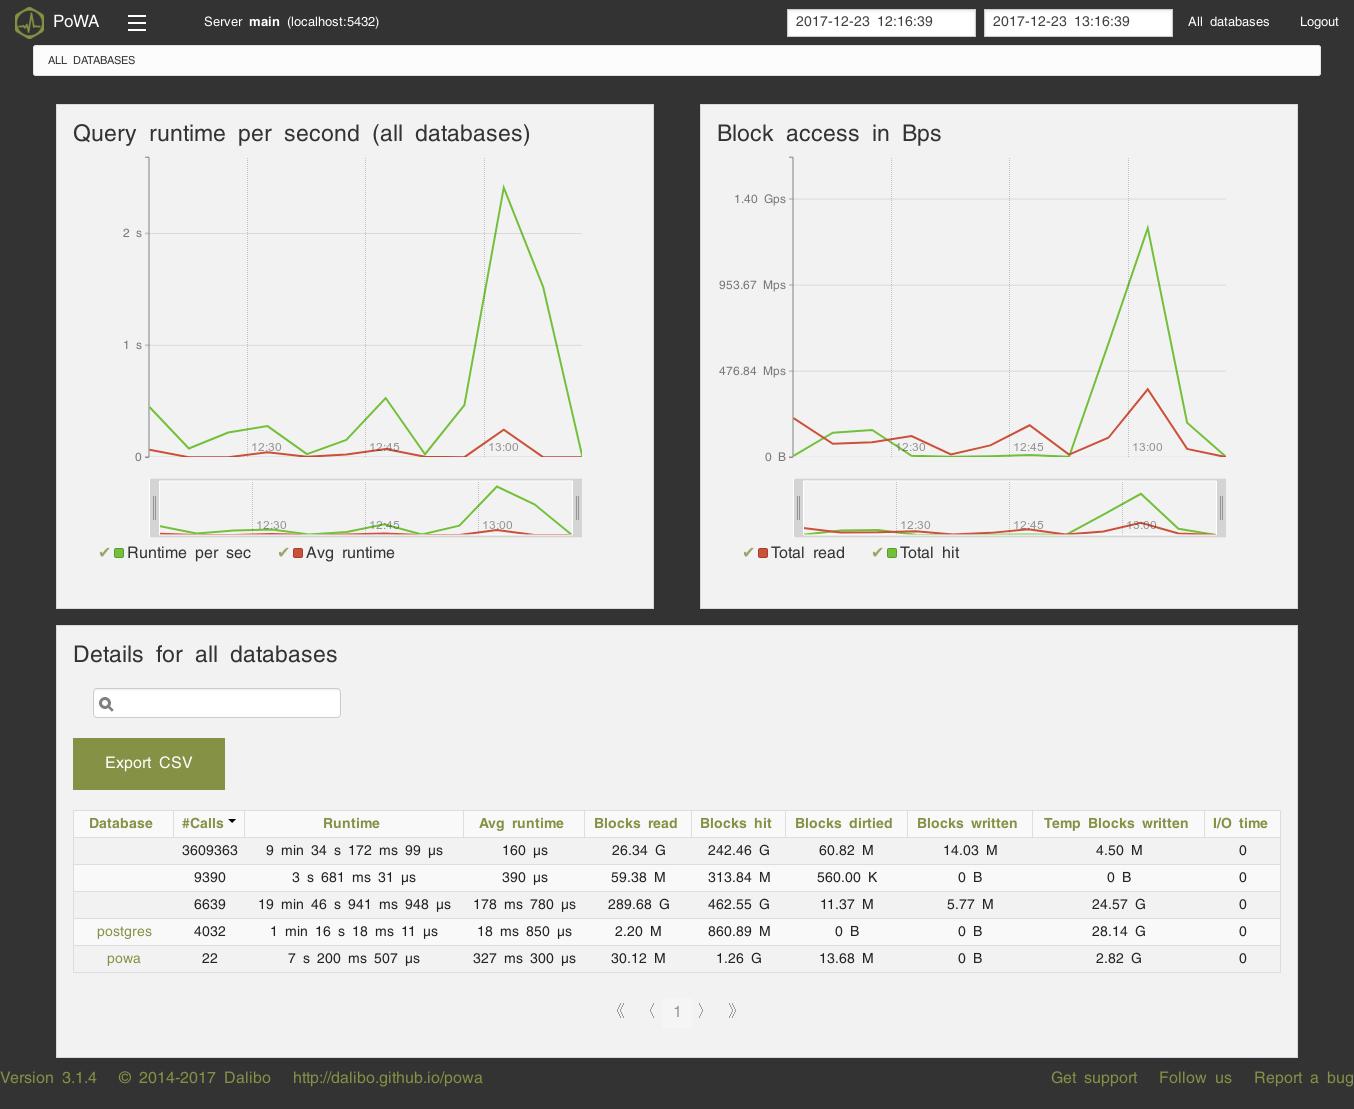 POWA-like мониторинг PostgreSQL с помощью Prometheus - 1